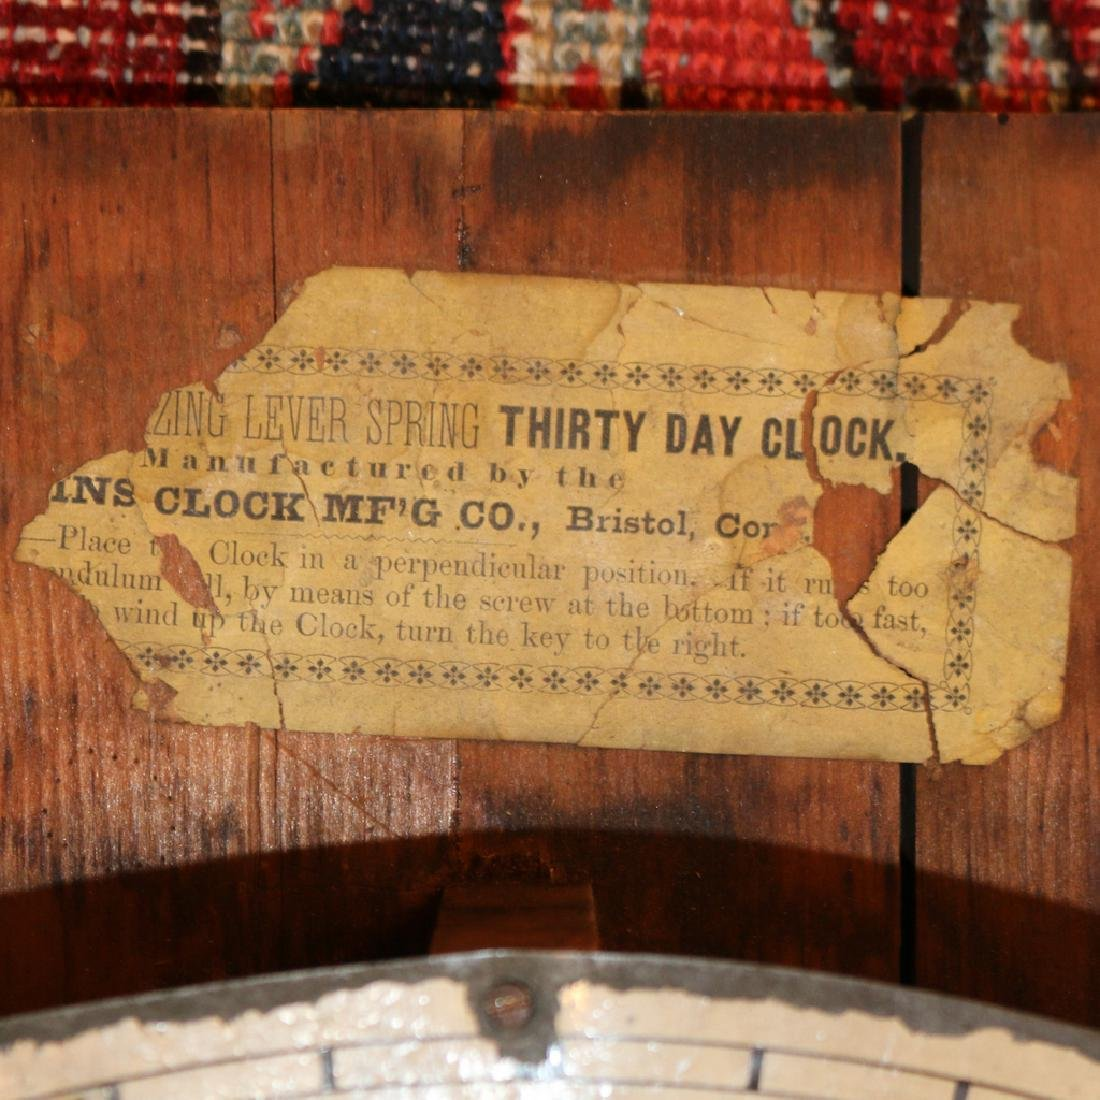 ATKINS THIRTY-DAY WAGON SPRING GALLERY CLOCK - 4